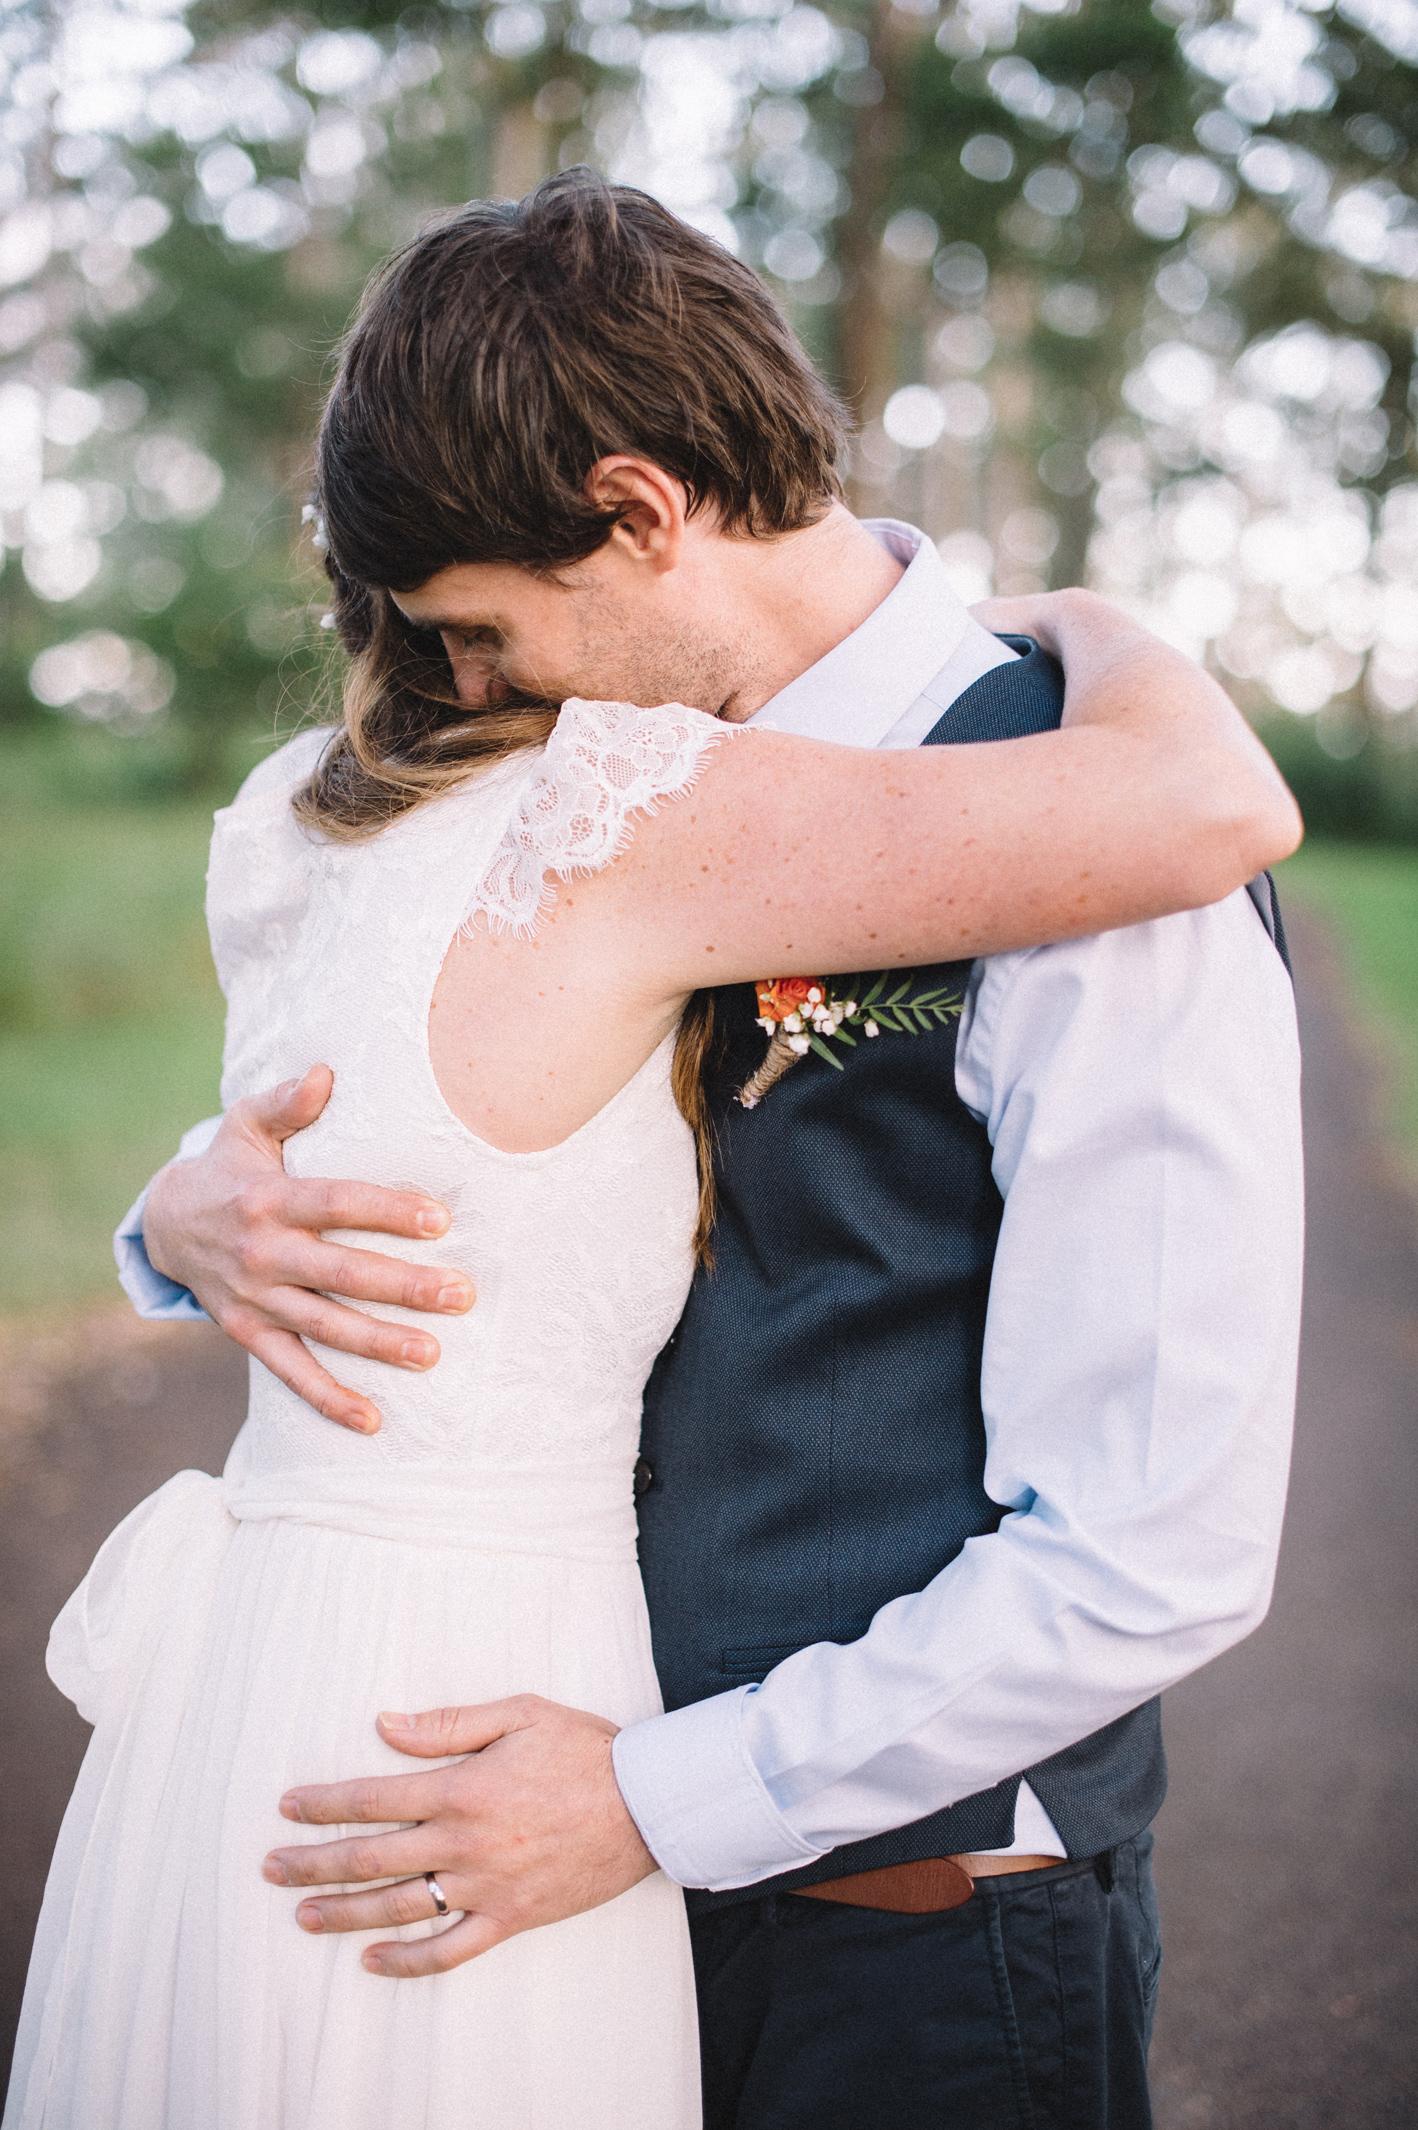 064-michelle-reagan-mount-tamborine-wedding-sophie-baker-photography